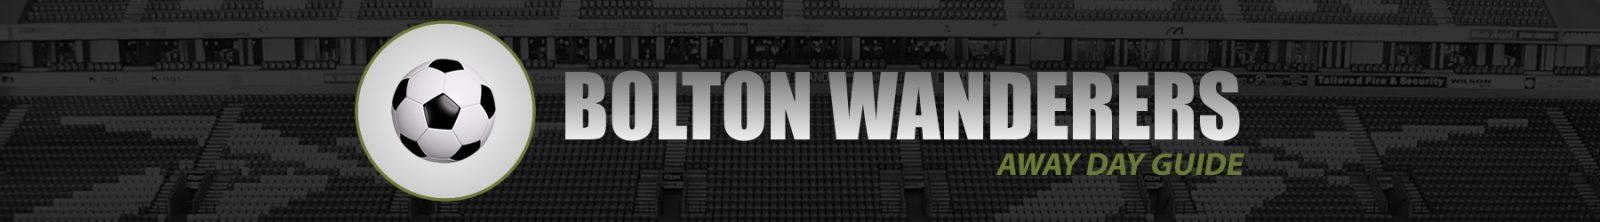 Bolton Wanderers Away